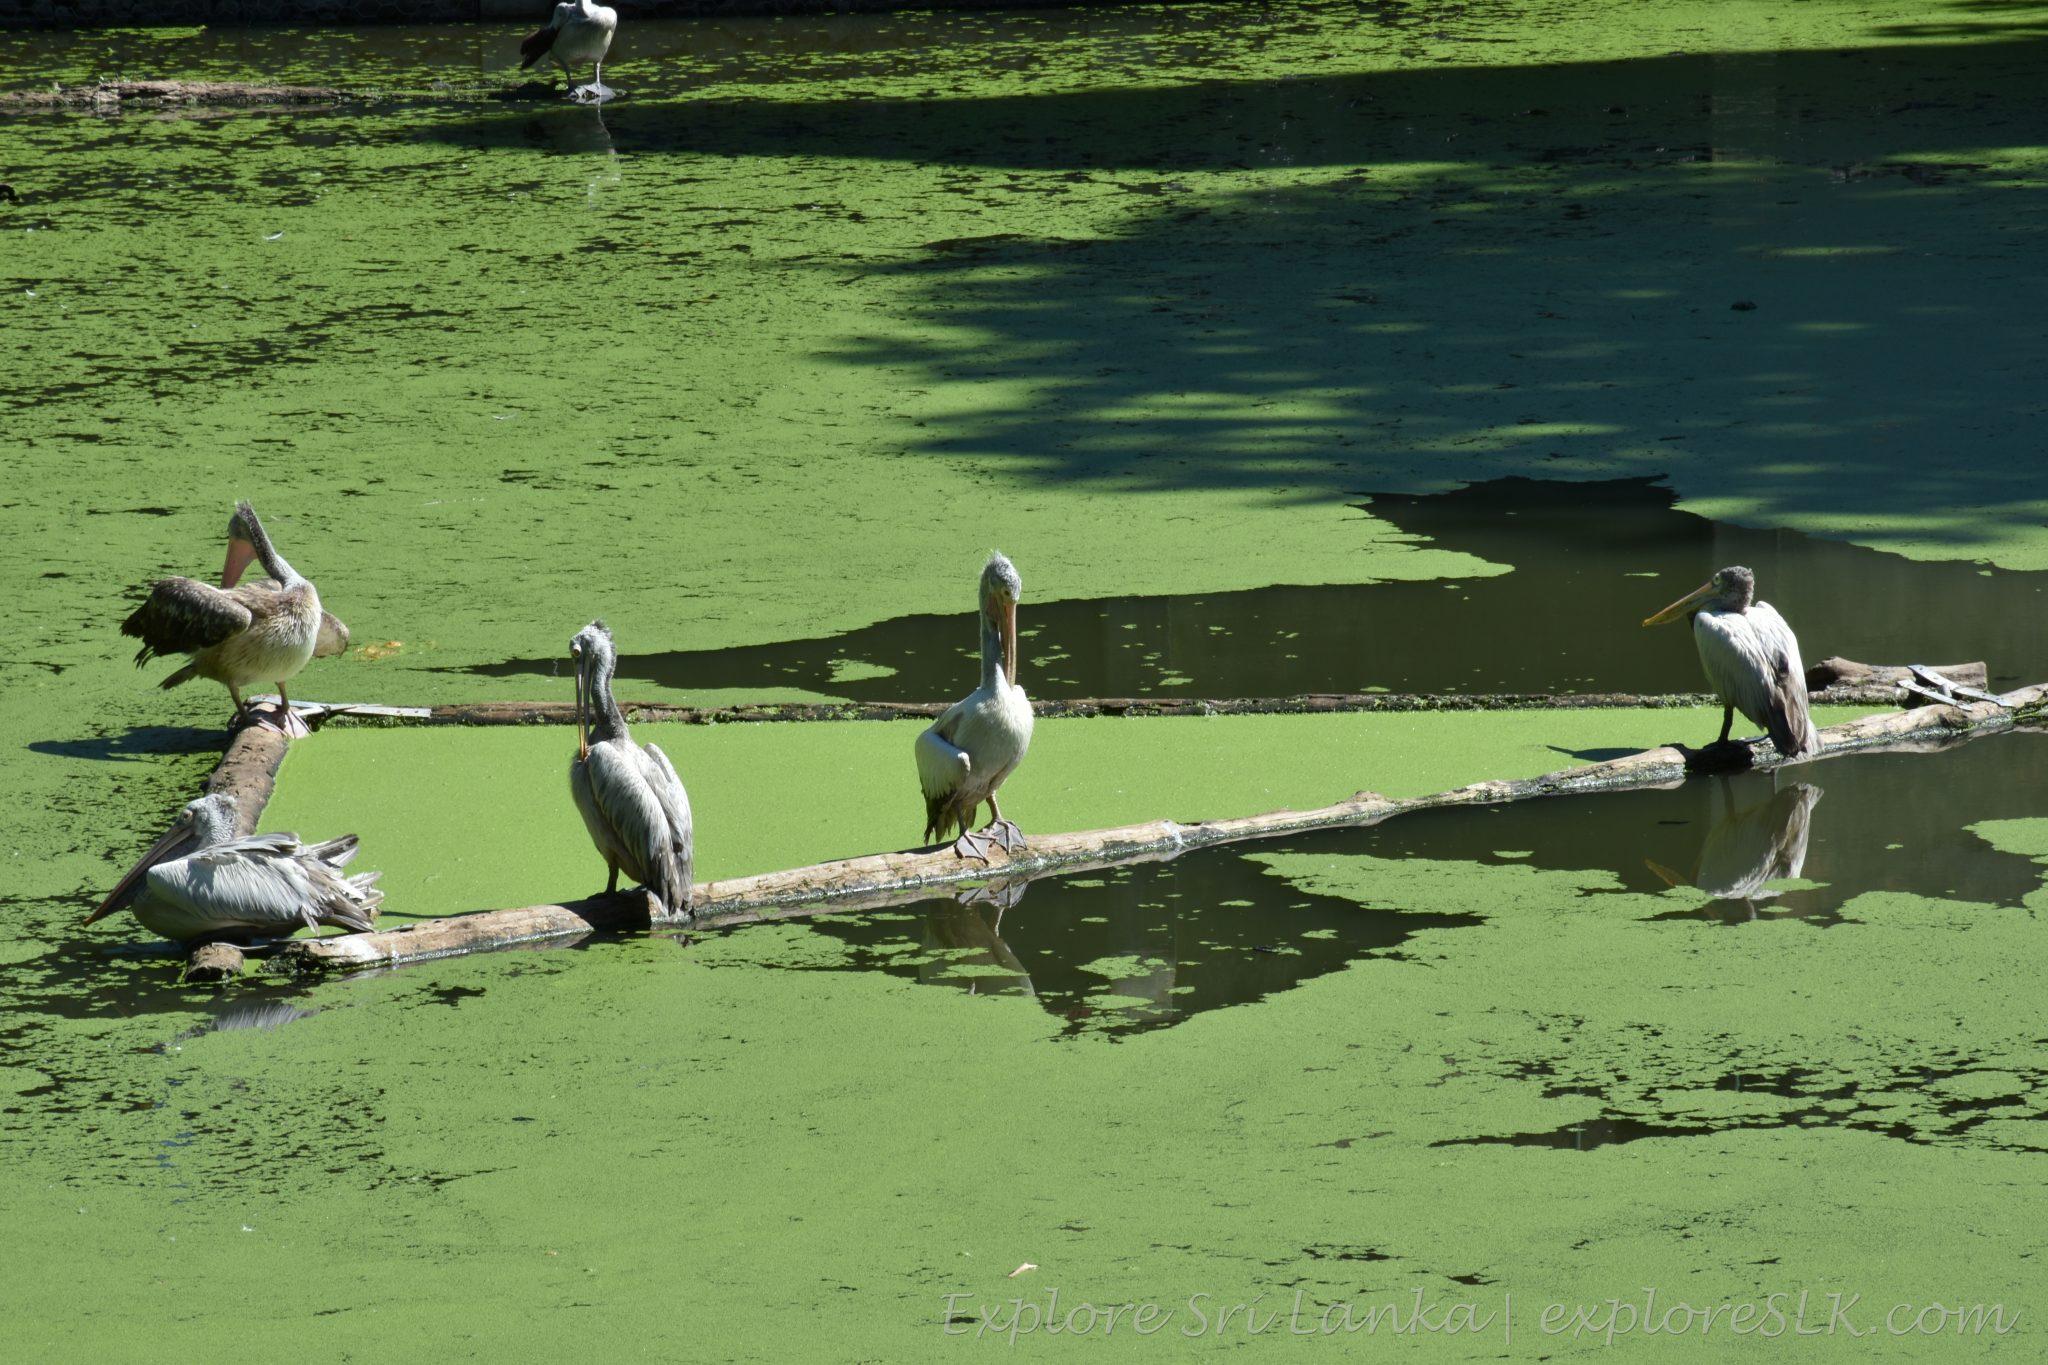 Pond of Pelicans at Dehiwala Zoo